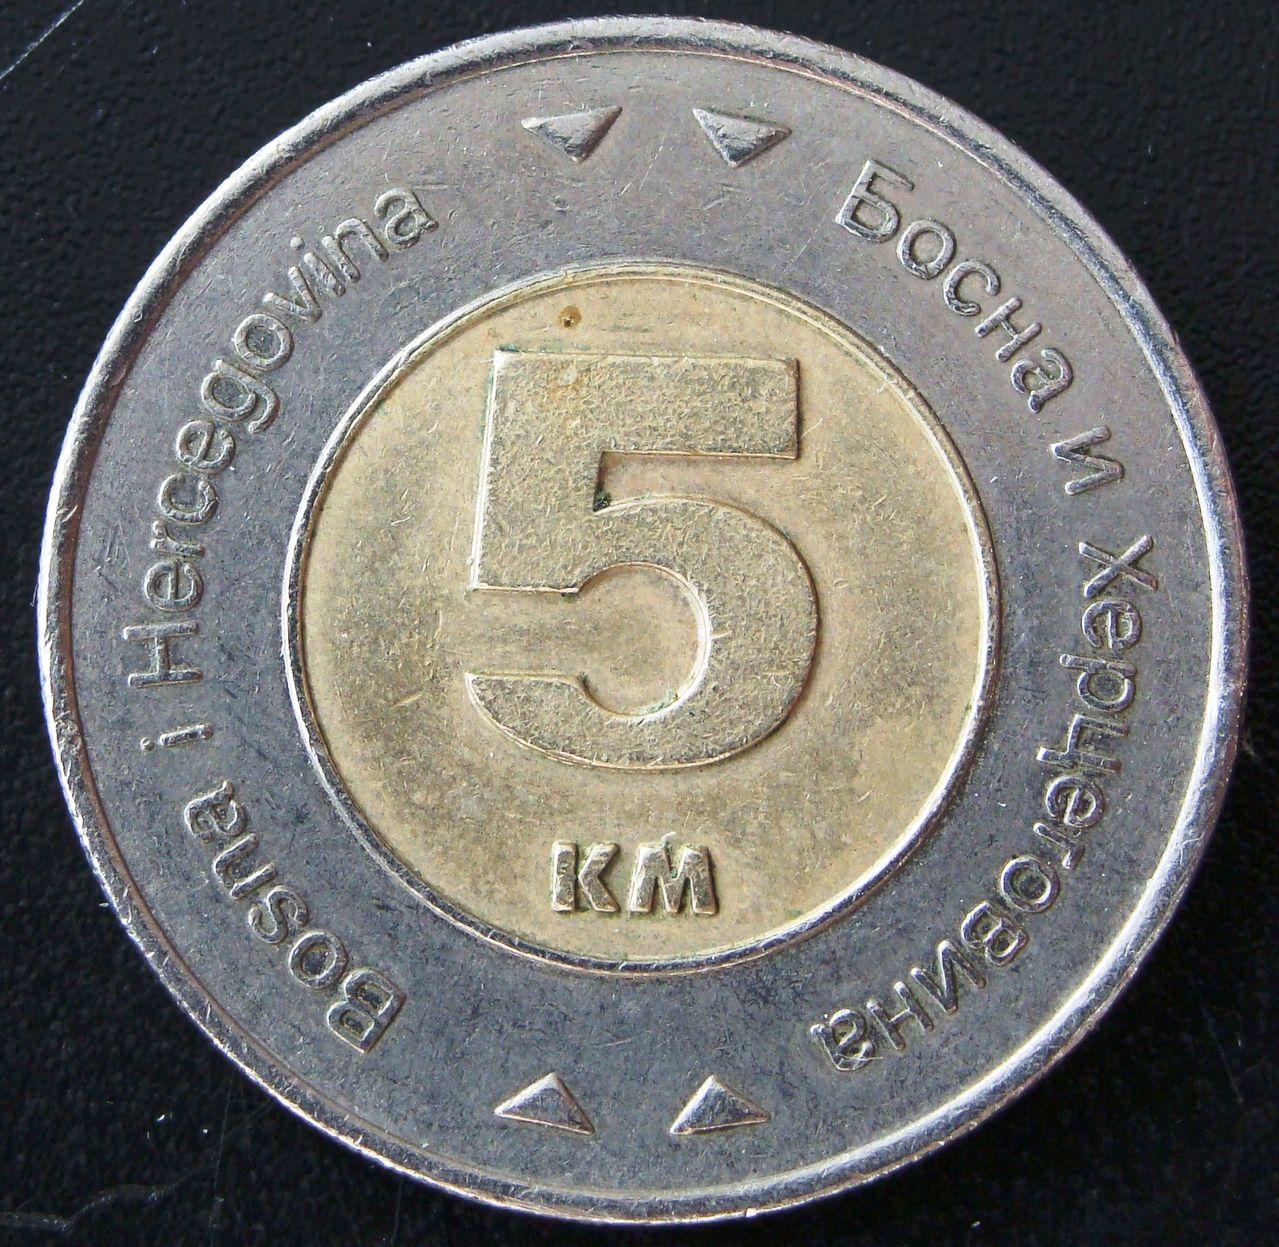 5 Marcos. Bosnia-Herzegovina (2005) BIH_5_Marcos_2005_rev